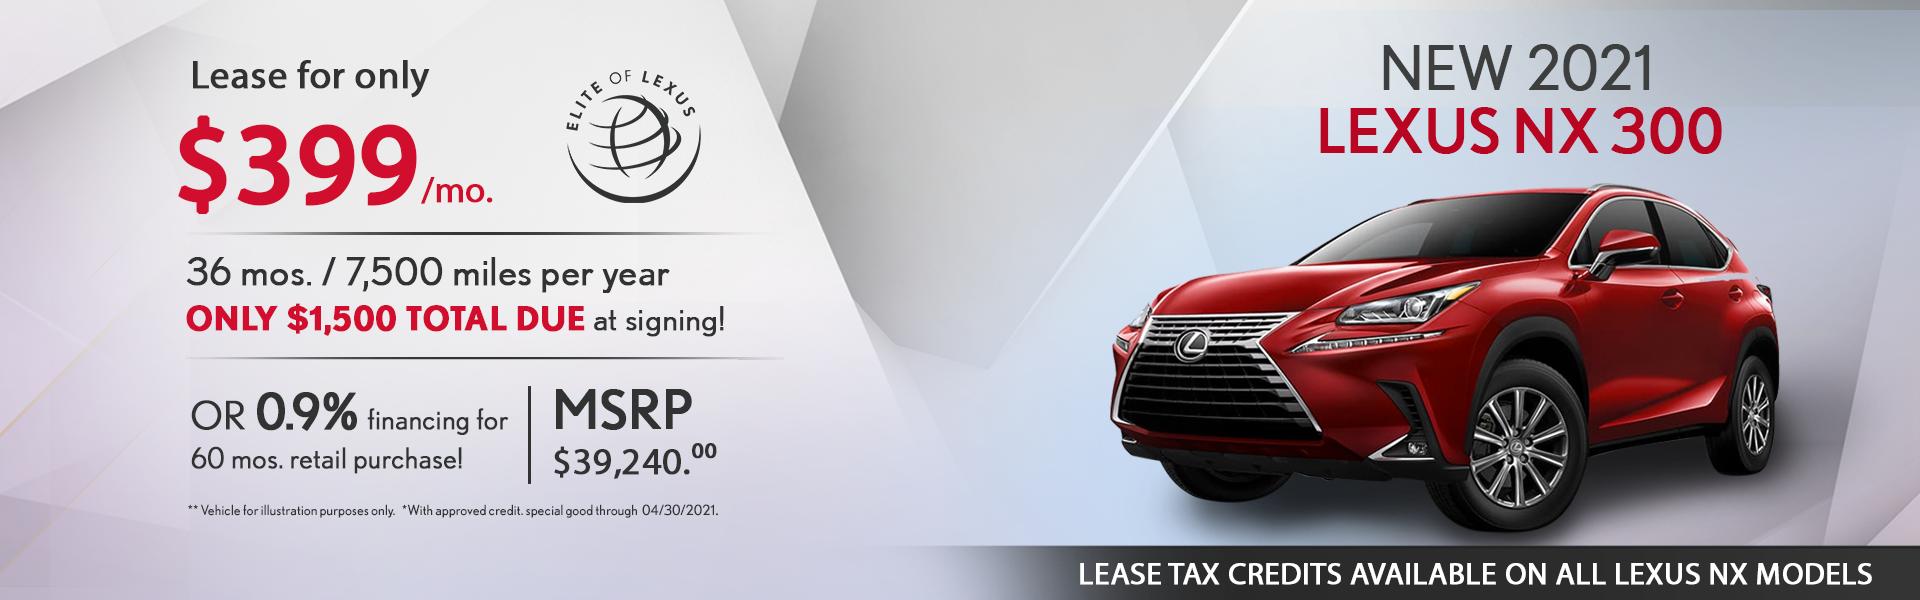 Lexus NX 300 Lease Special